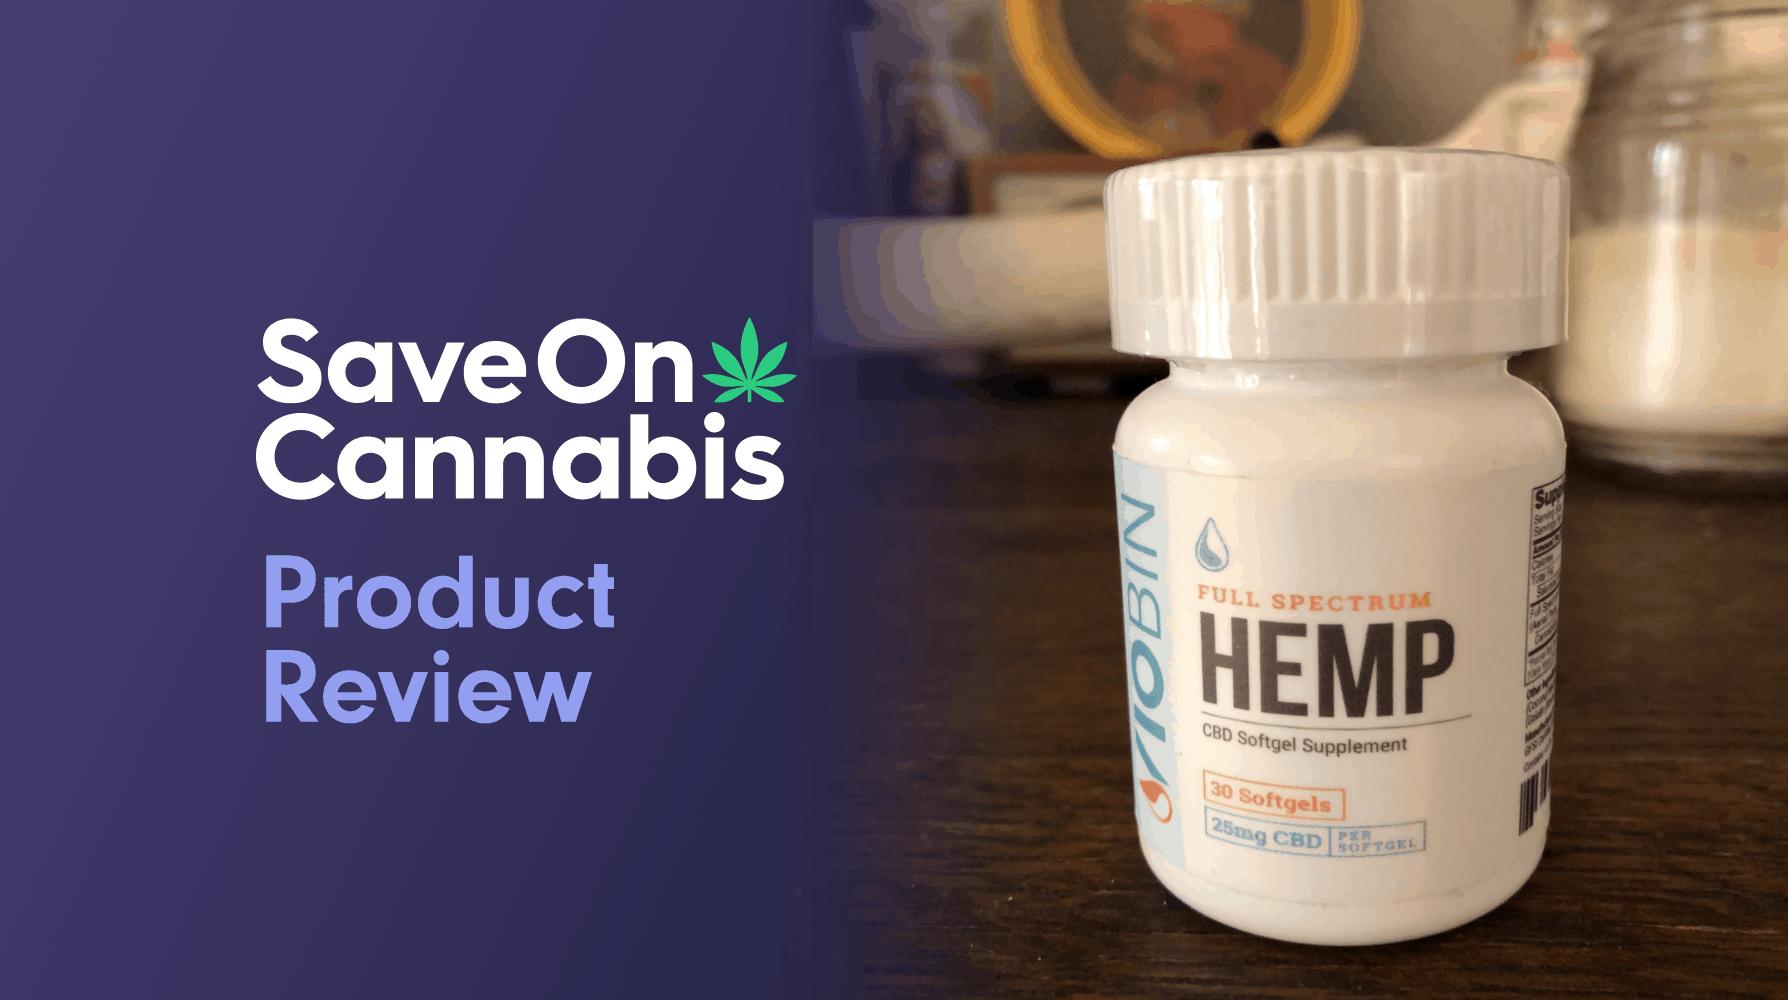 viobin full spectrum cbd softgels 25 mg save on cannabis website